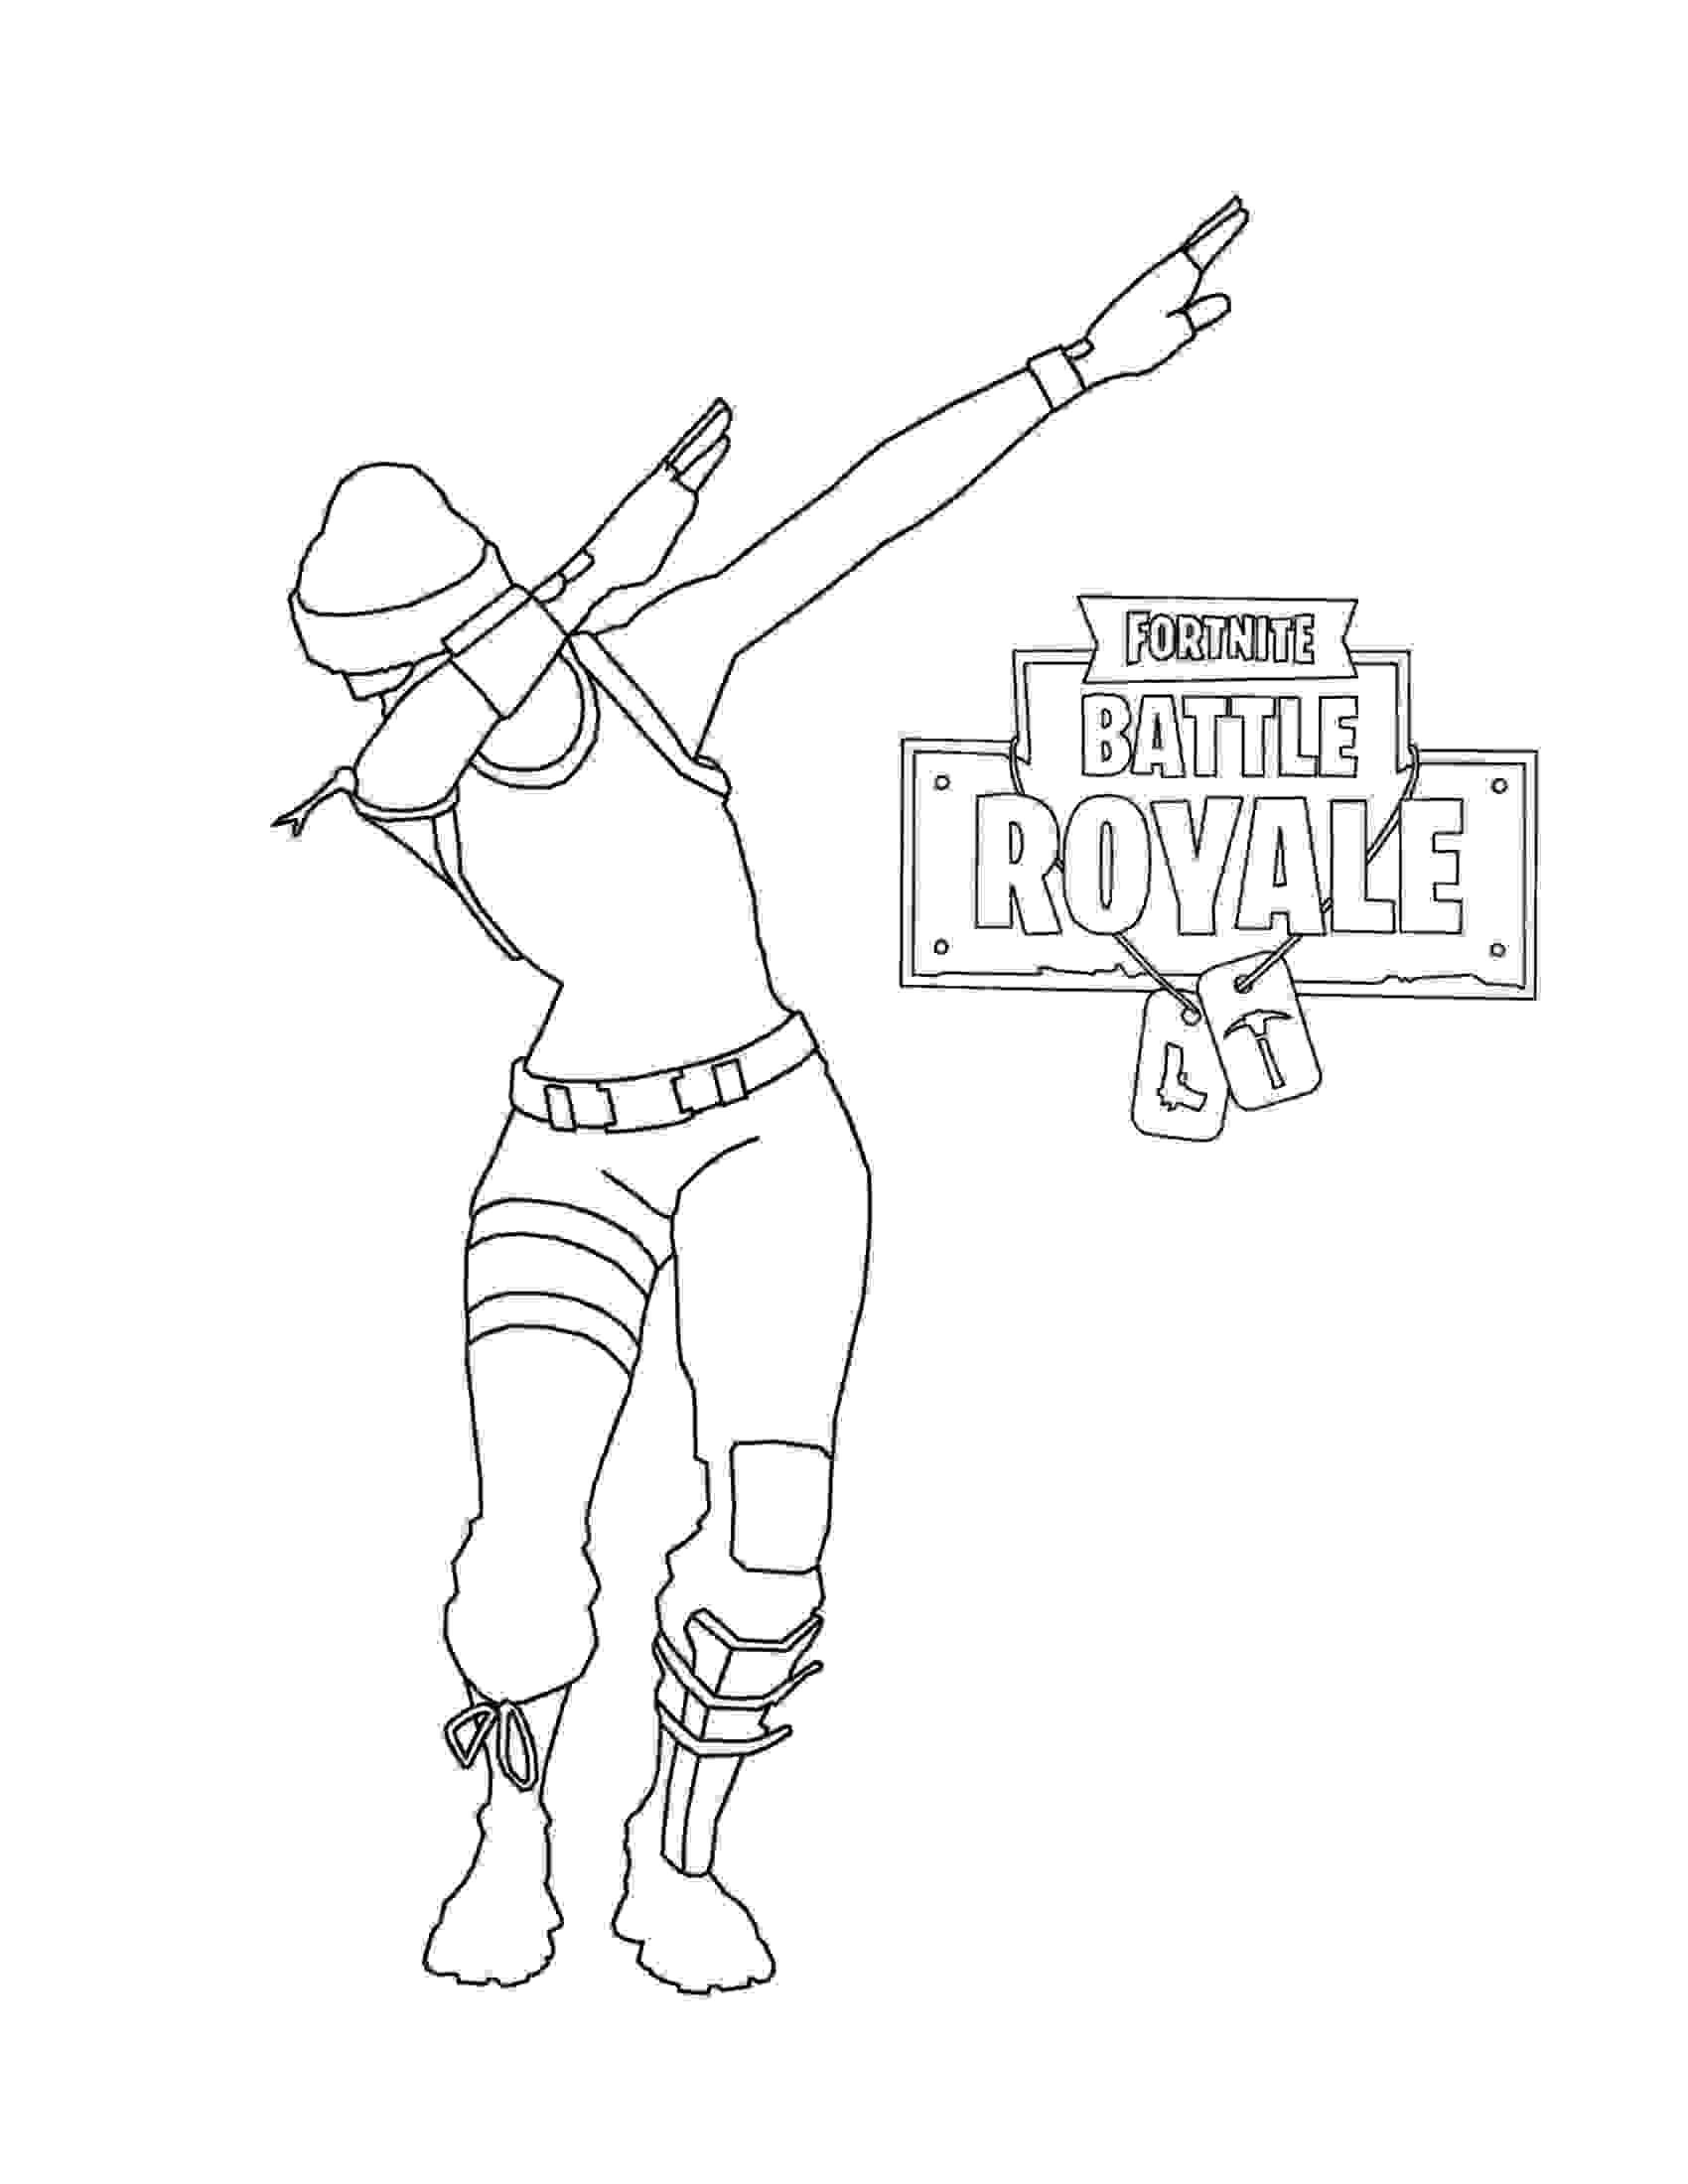 Scarlet Defender is dancing in Fortnite Battle Royale Coloring Page